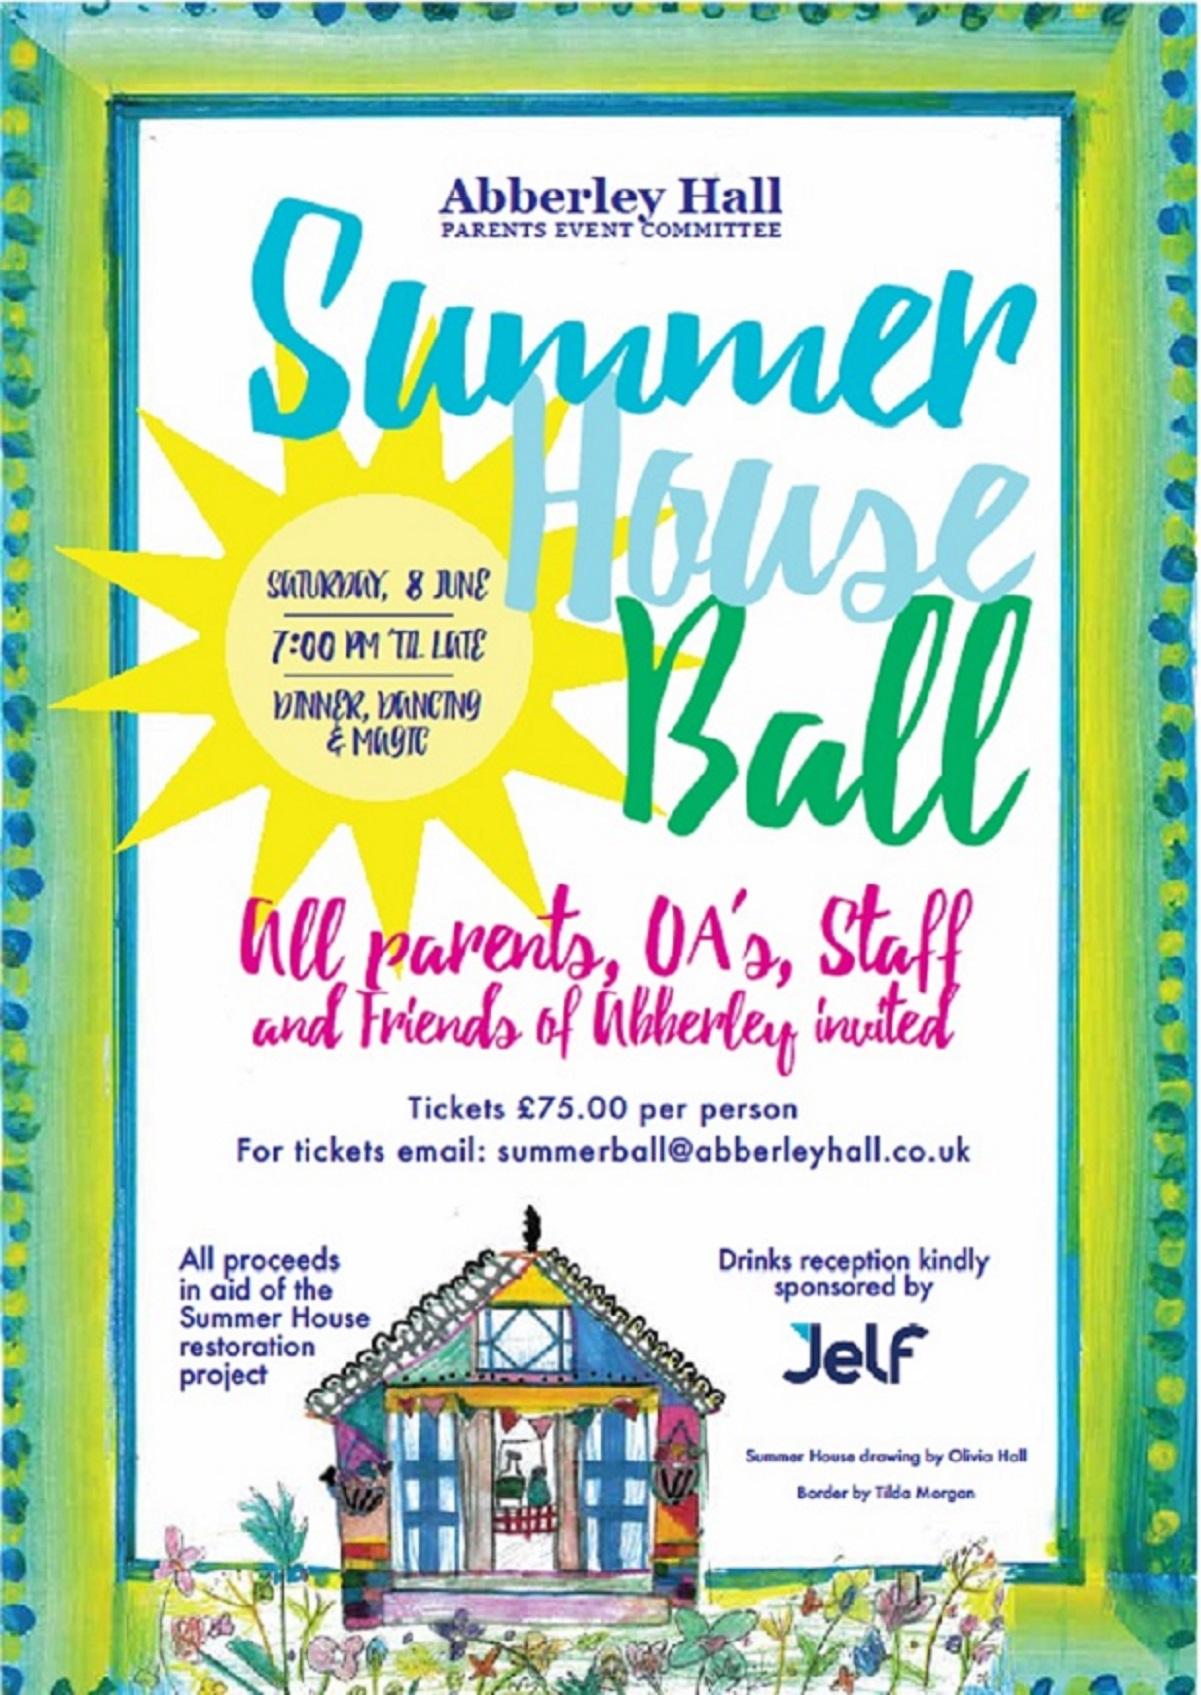 Abberley Hall Summer House Ball